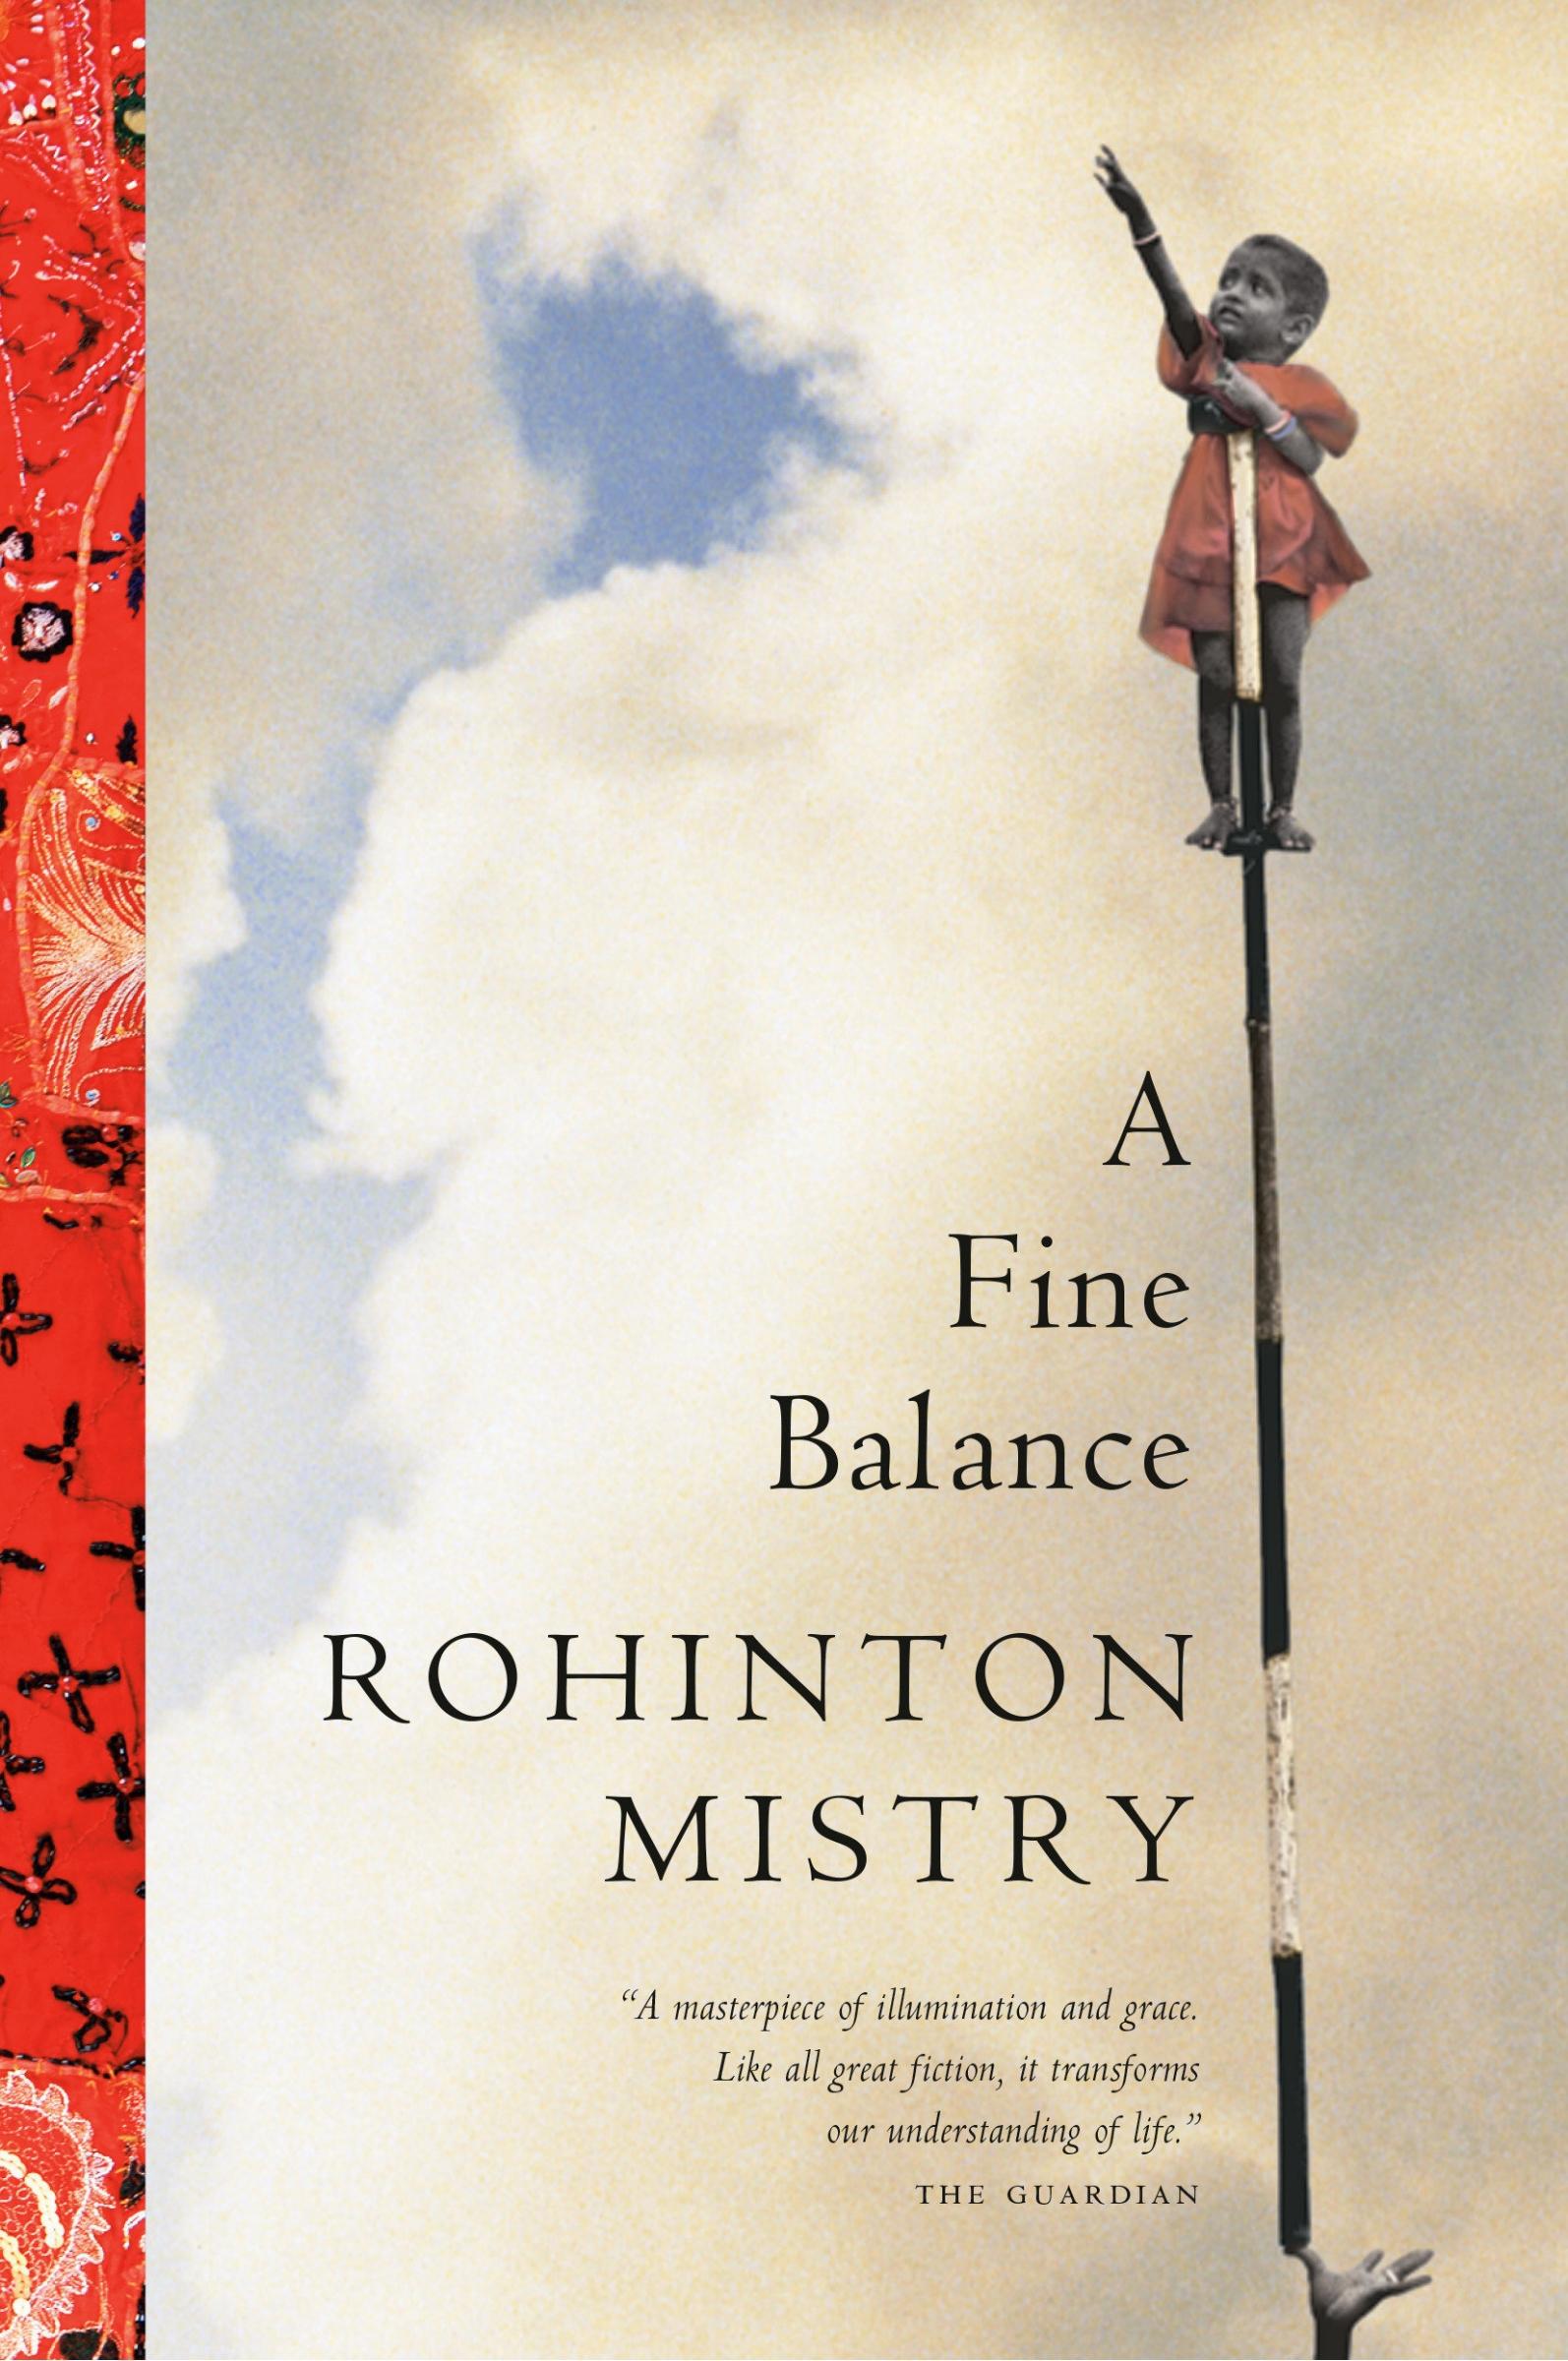 Book A Fine Balance: Oprah's Book Club No. 44 by Rohinton Mistry